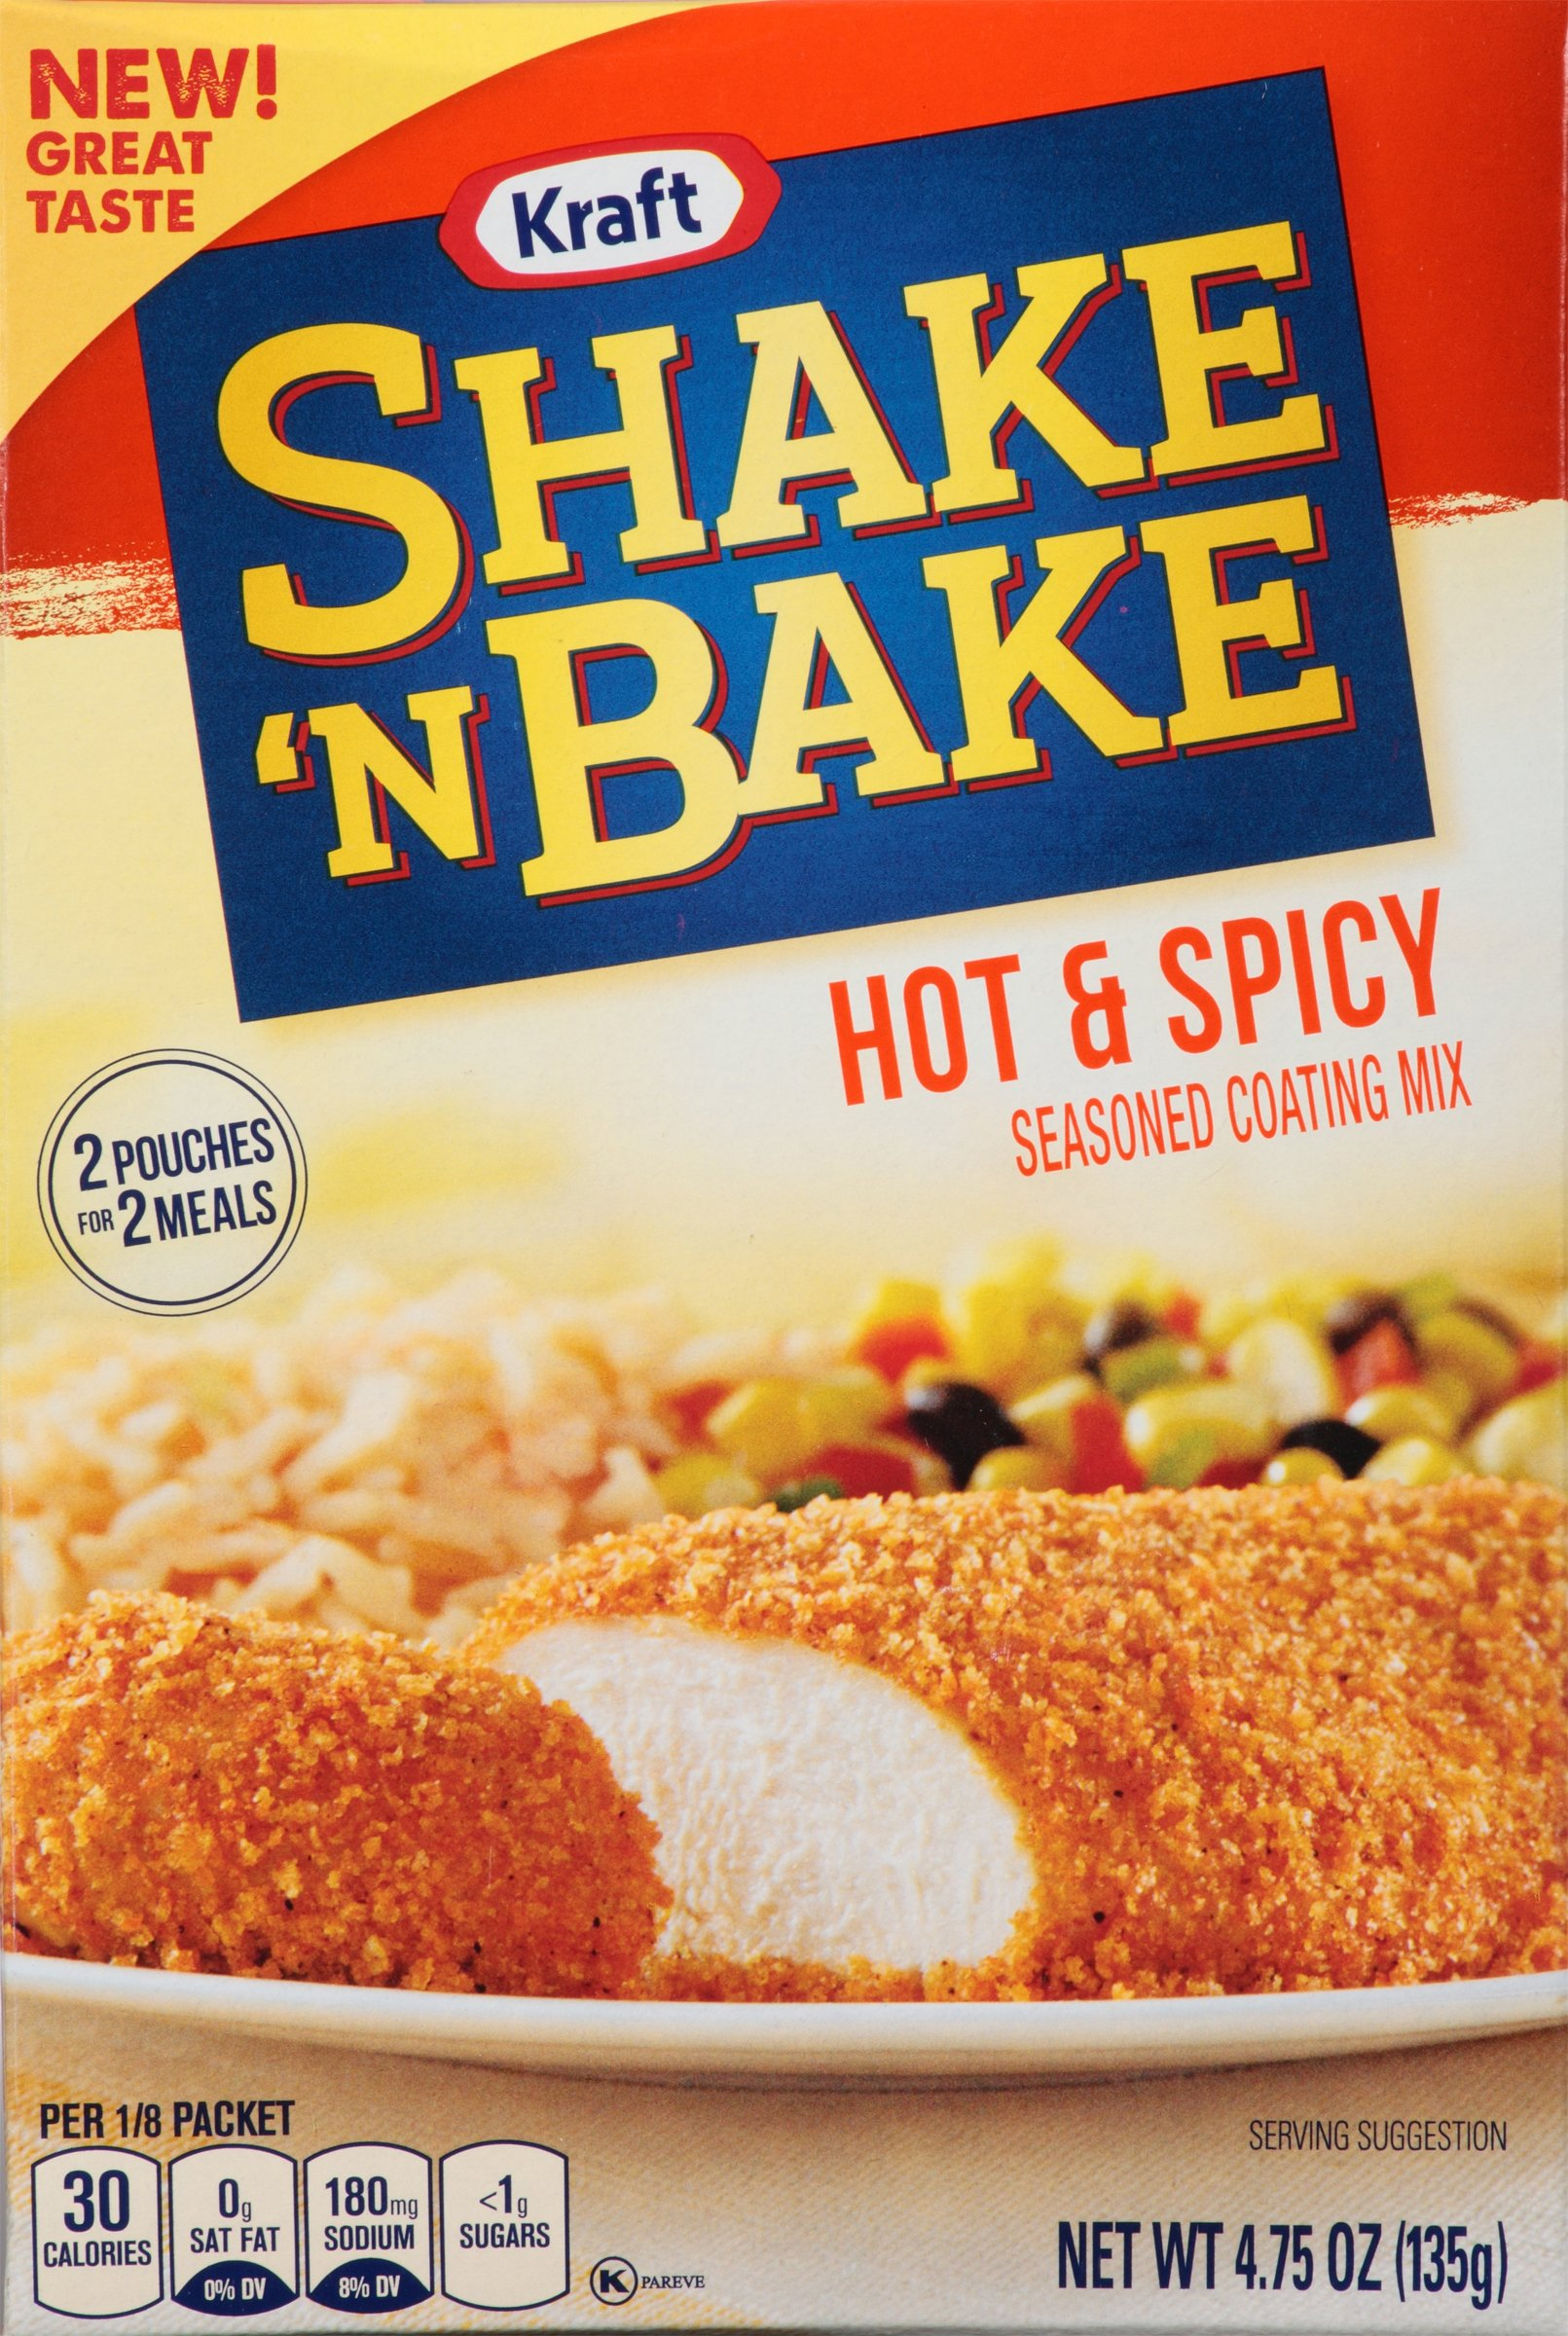 Kraft Shake N Bake Seasoned Coating Mix Box, Hot and Spicy, 4.75 Ounce (Pack of 8)